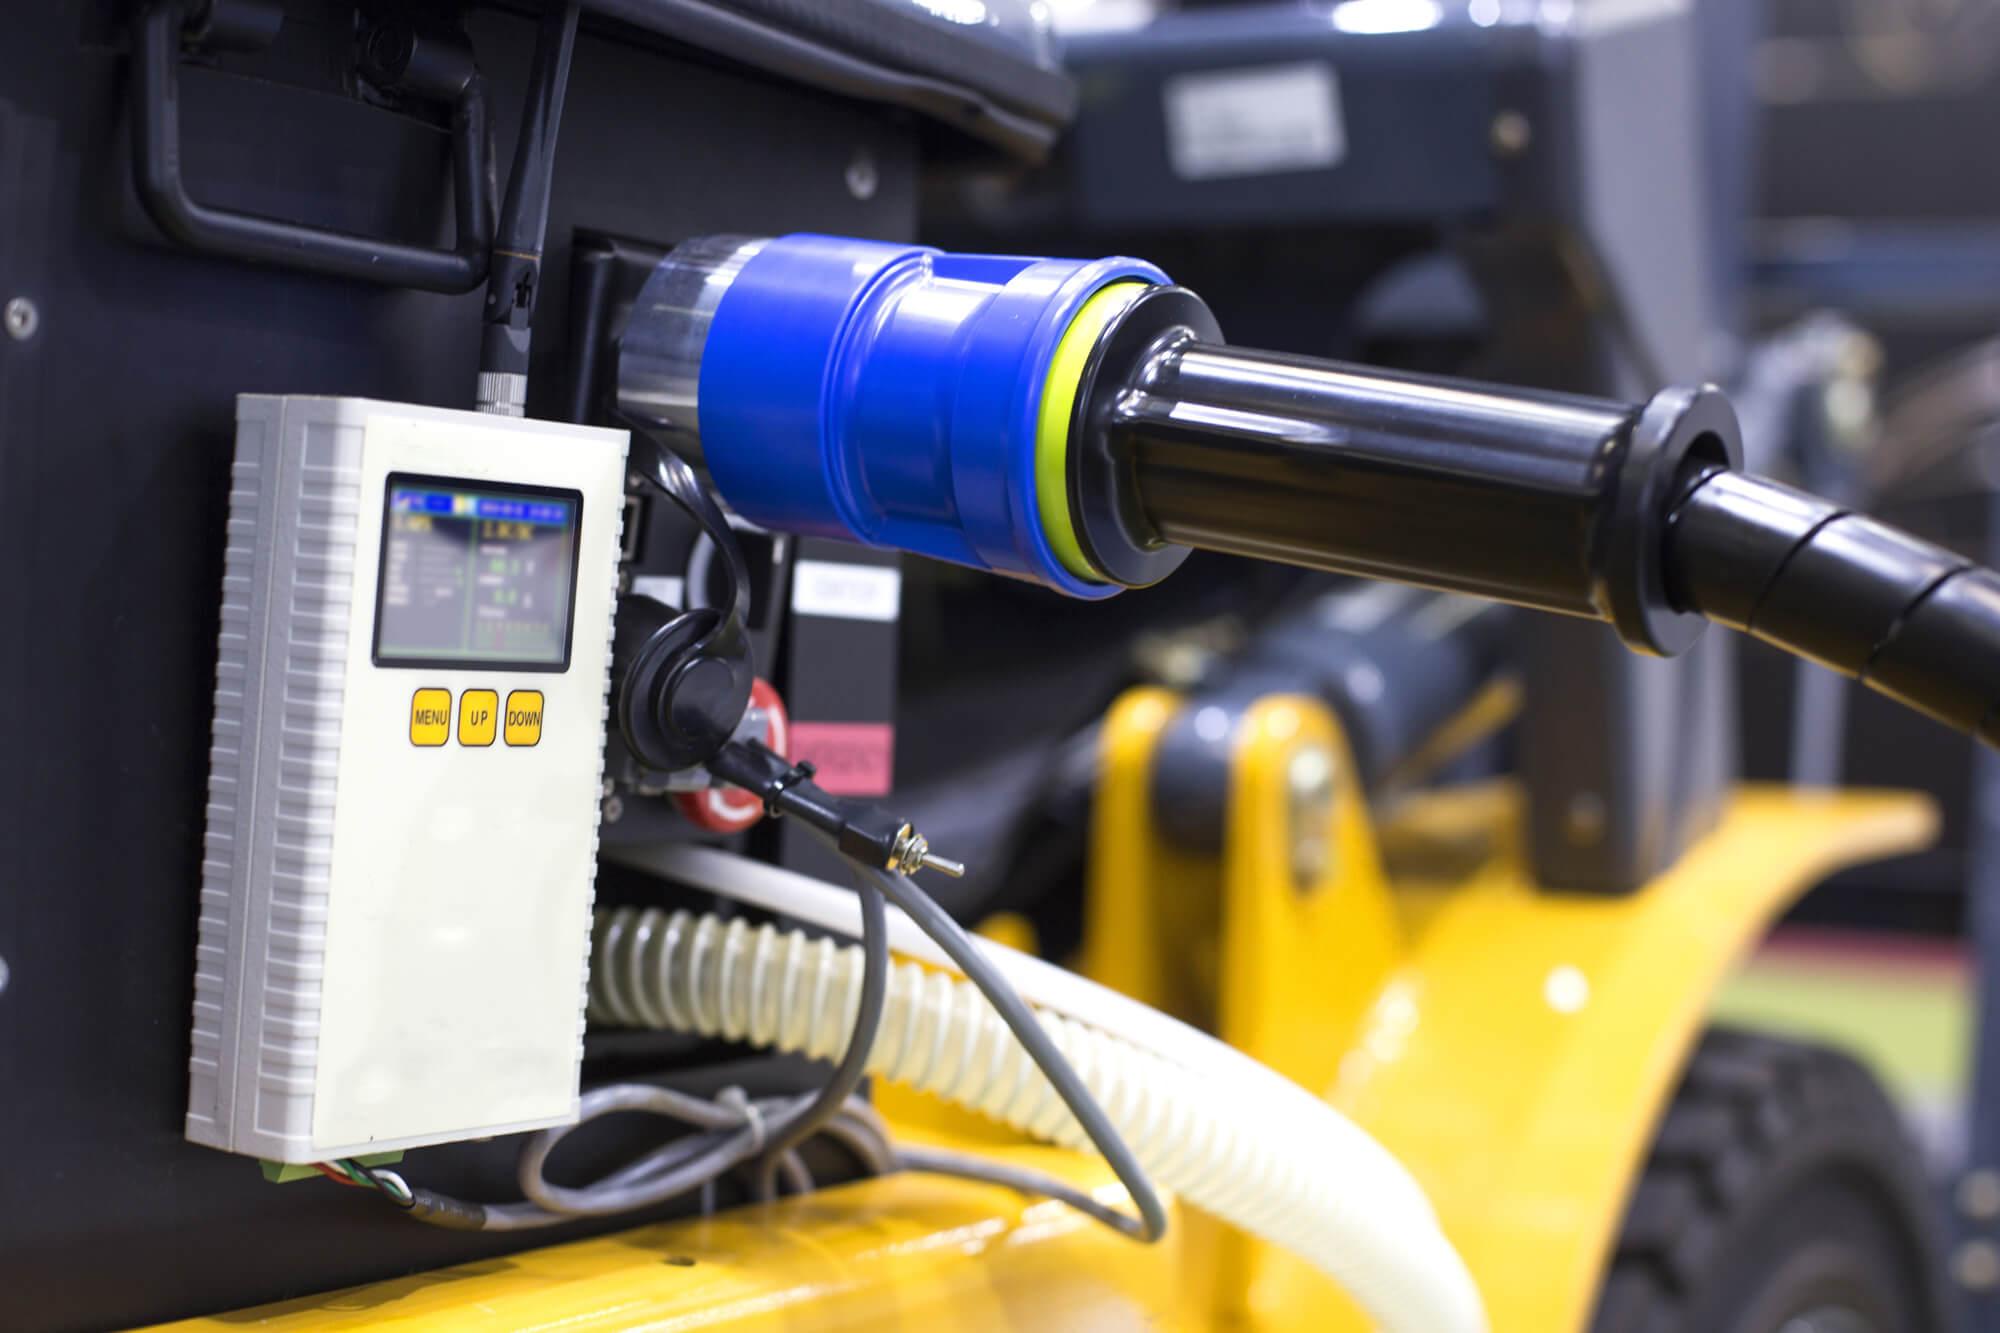 Forklift Preventive Maintenance